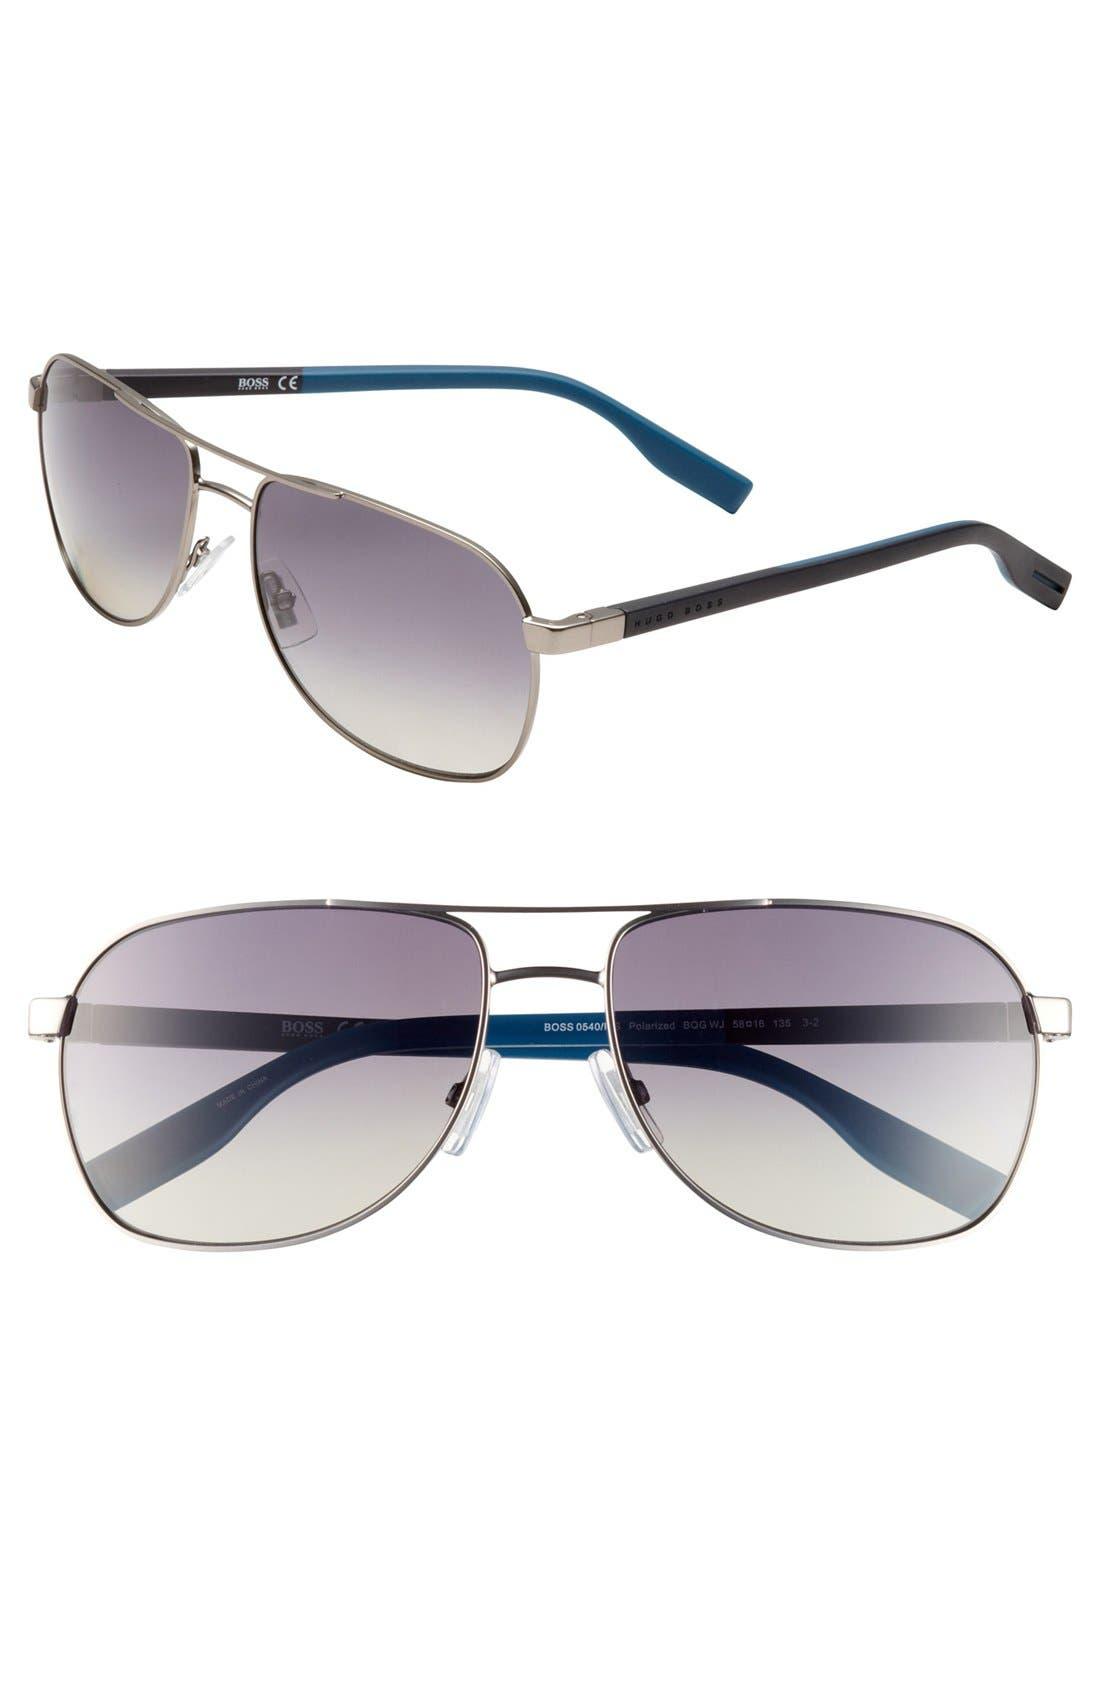 Alternate Image 1 Selected - BOSS Polarized Aviator Sunglasses